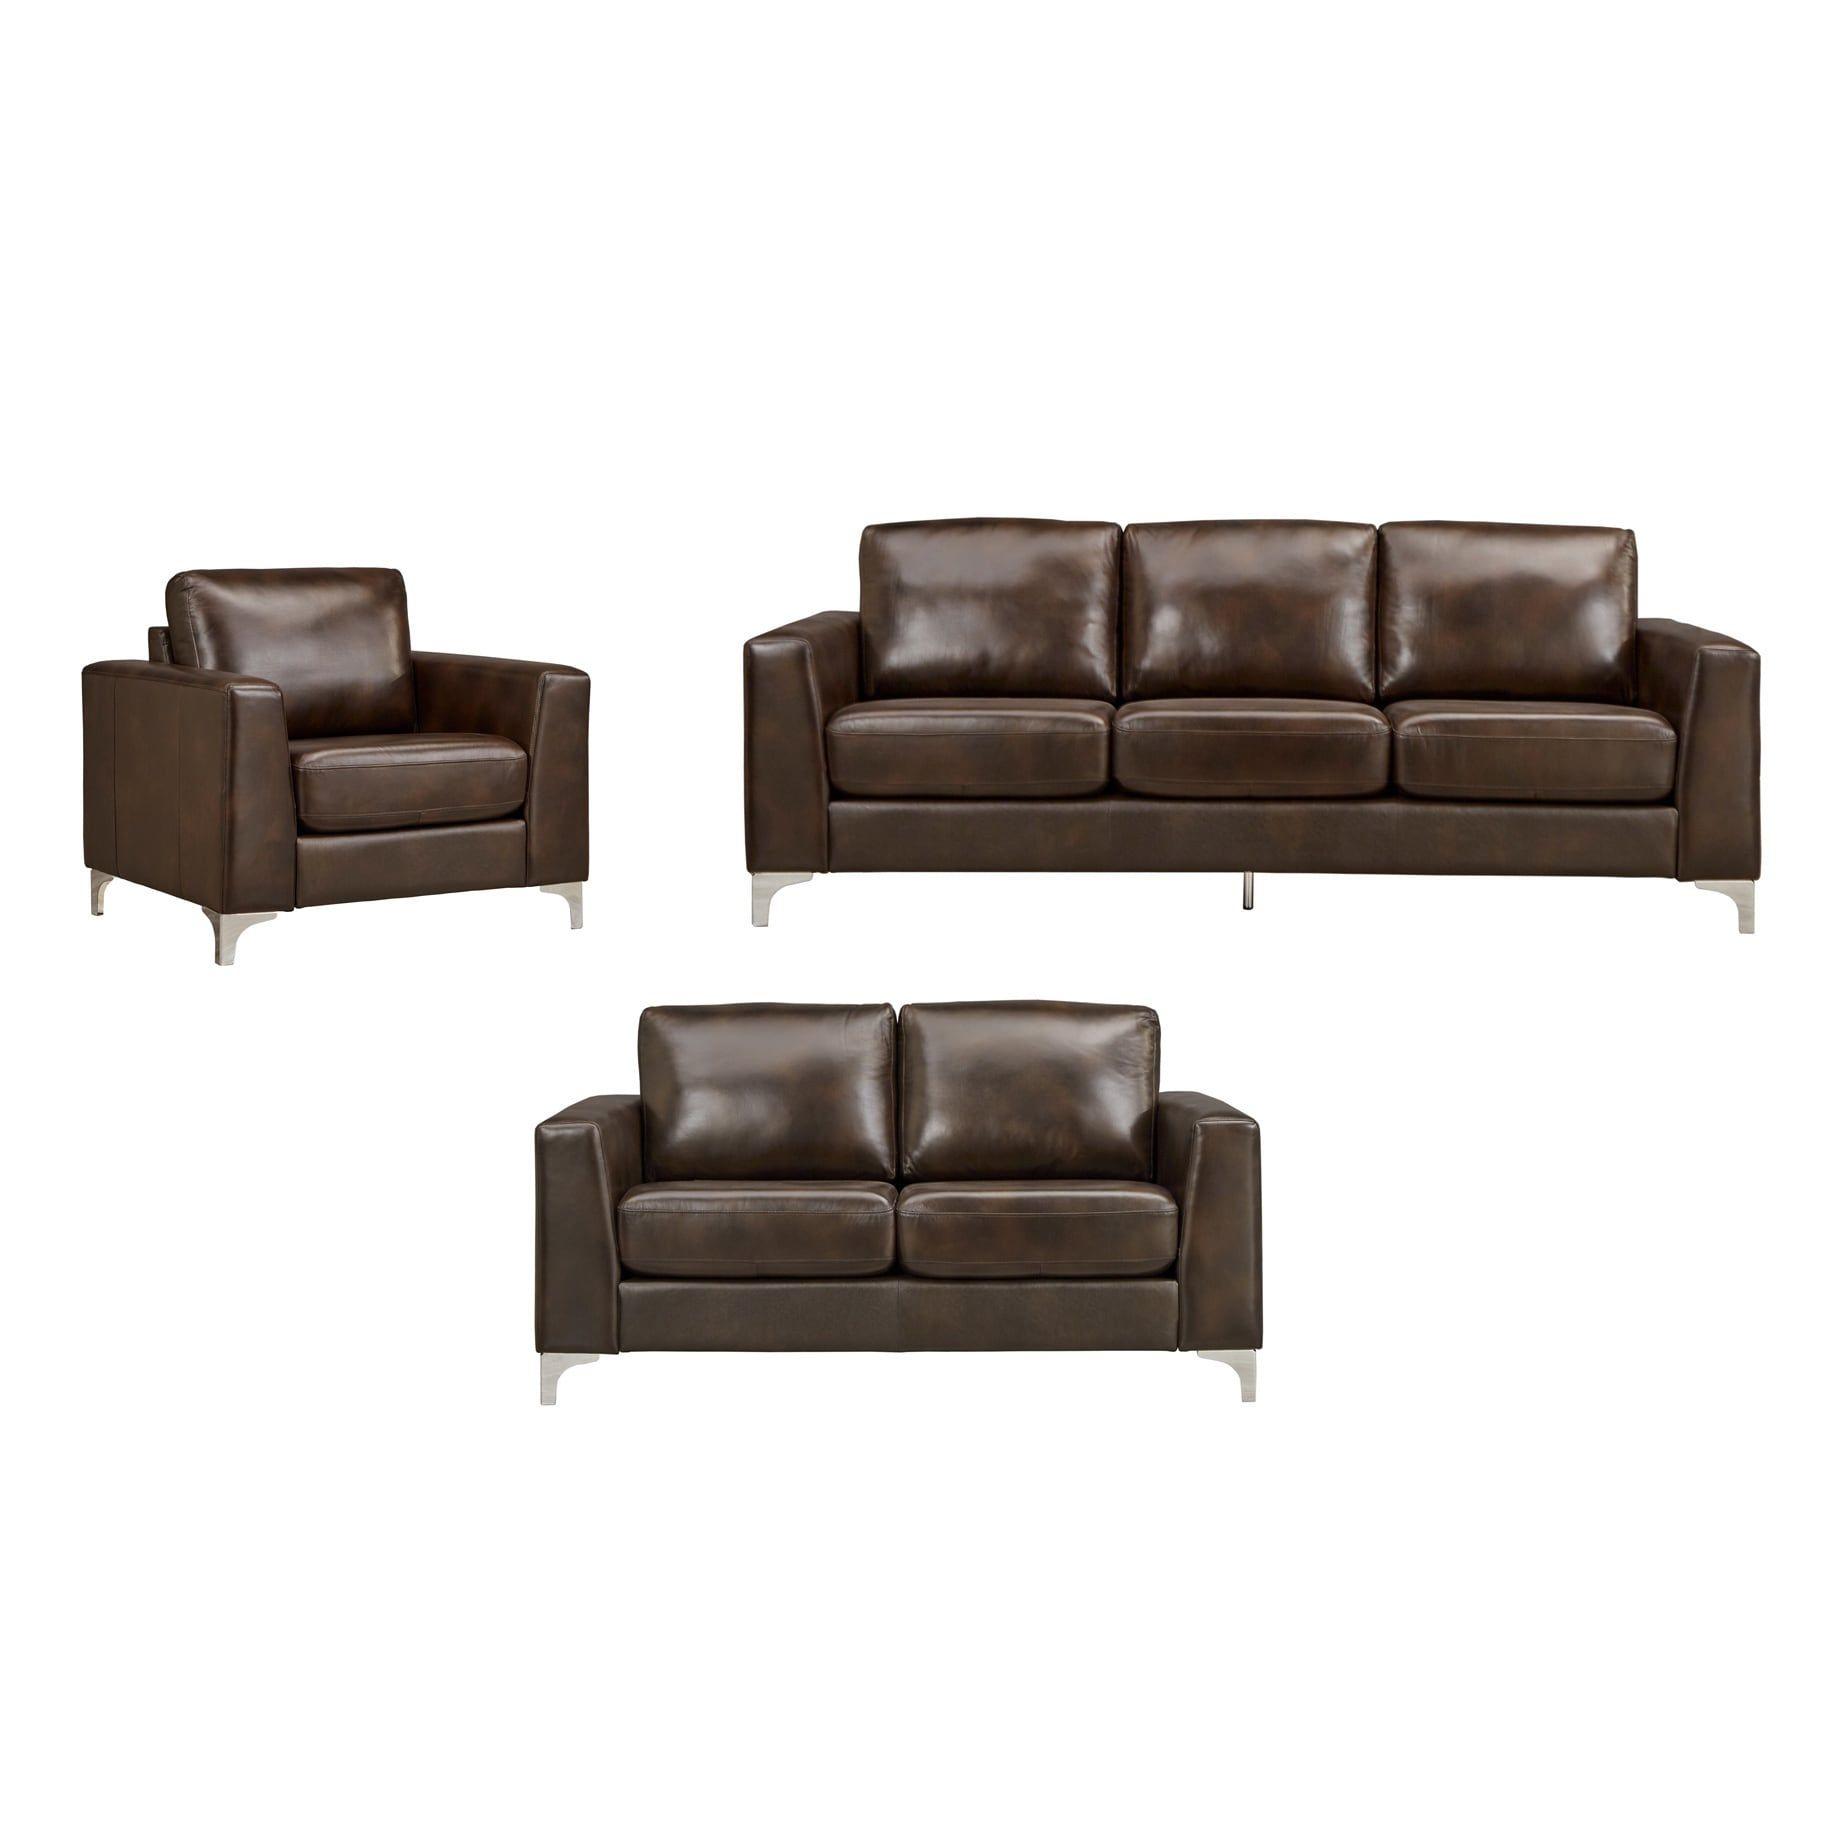 Bastian Aniline Leather Dark Brown Sofa iNSPIRE Q Modern (Loveseat ...